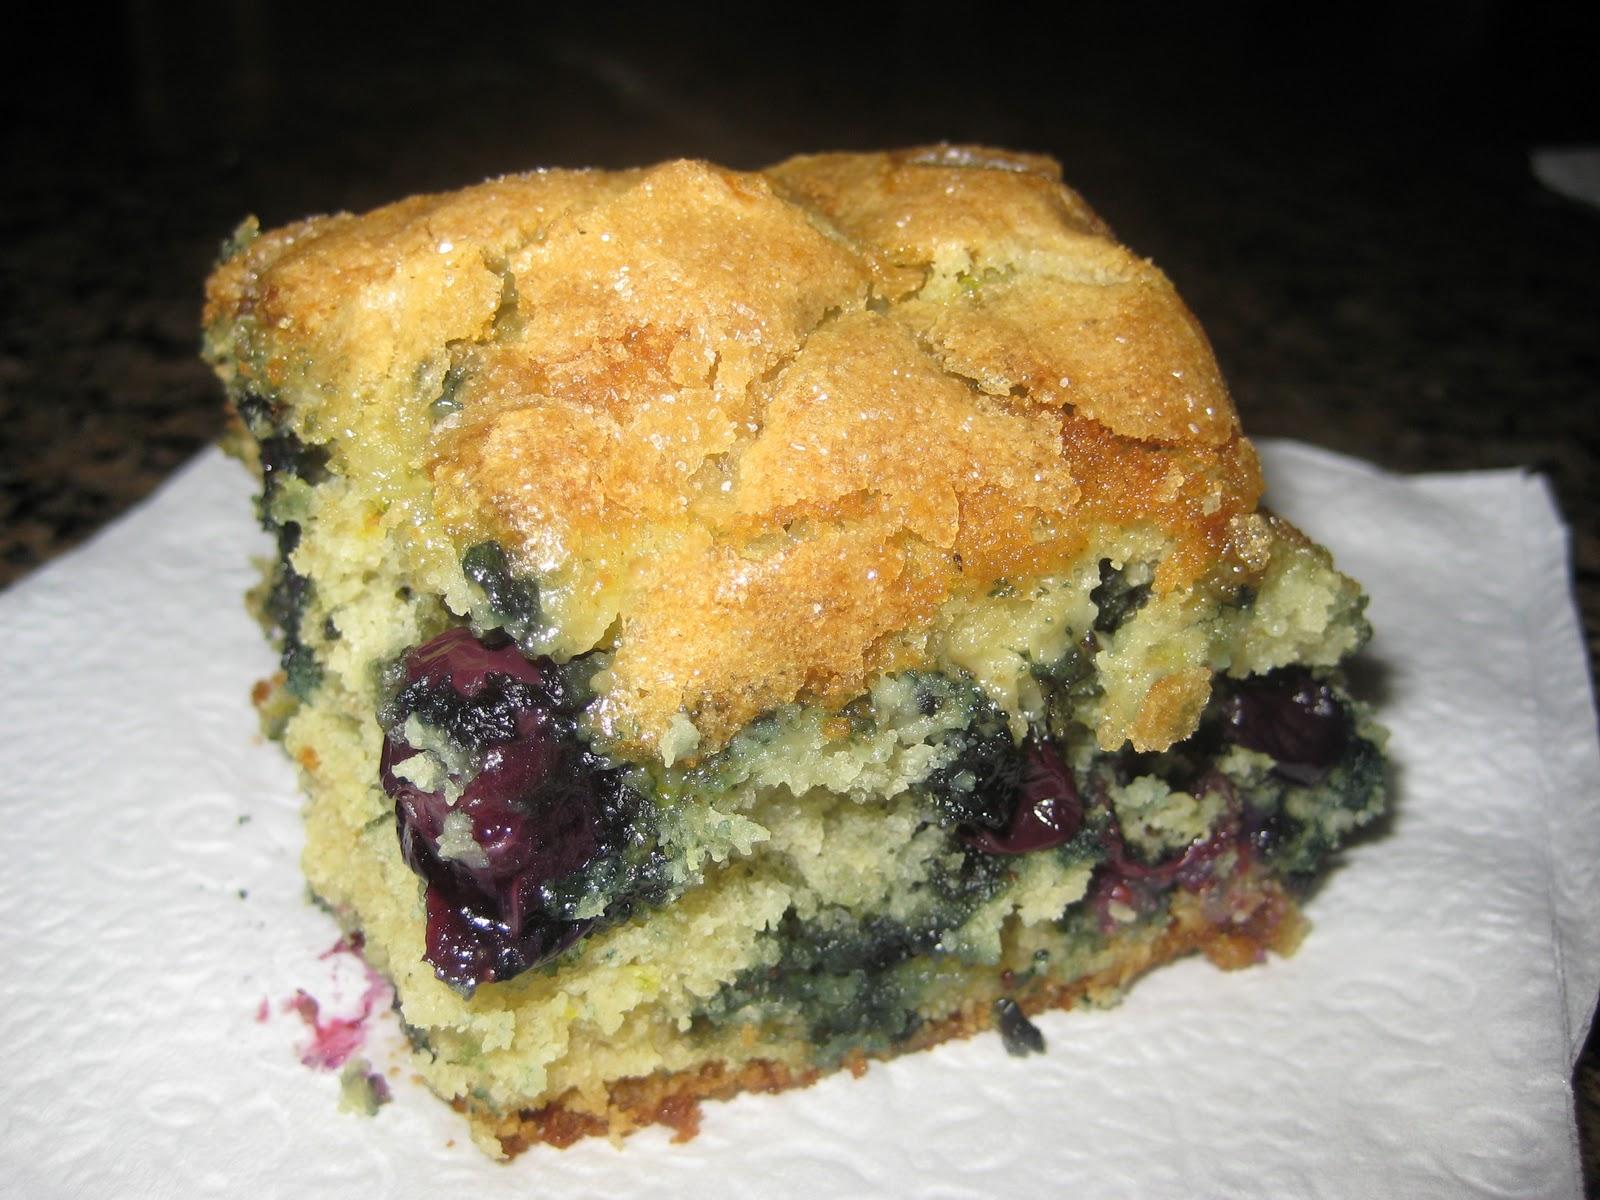 Britt's Apron: Buttermilk-Blueberry Breakfast Cake